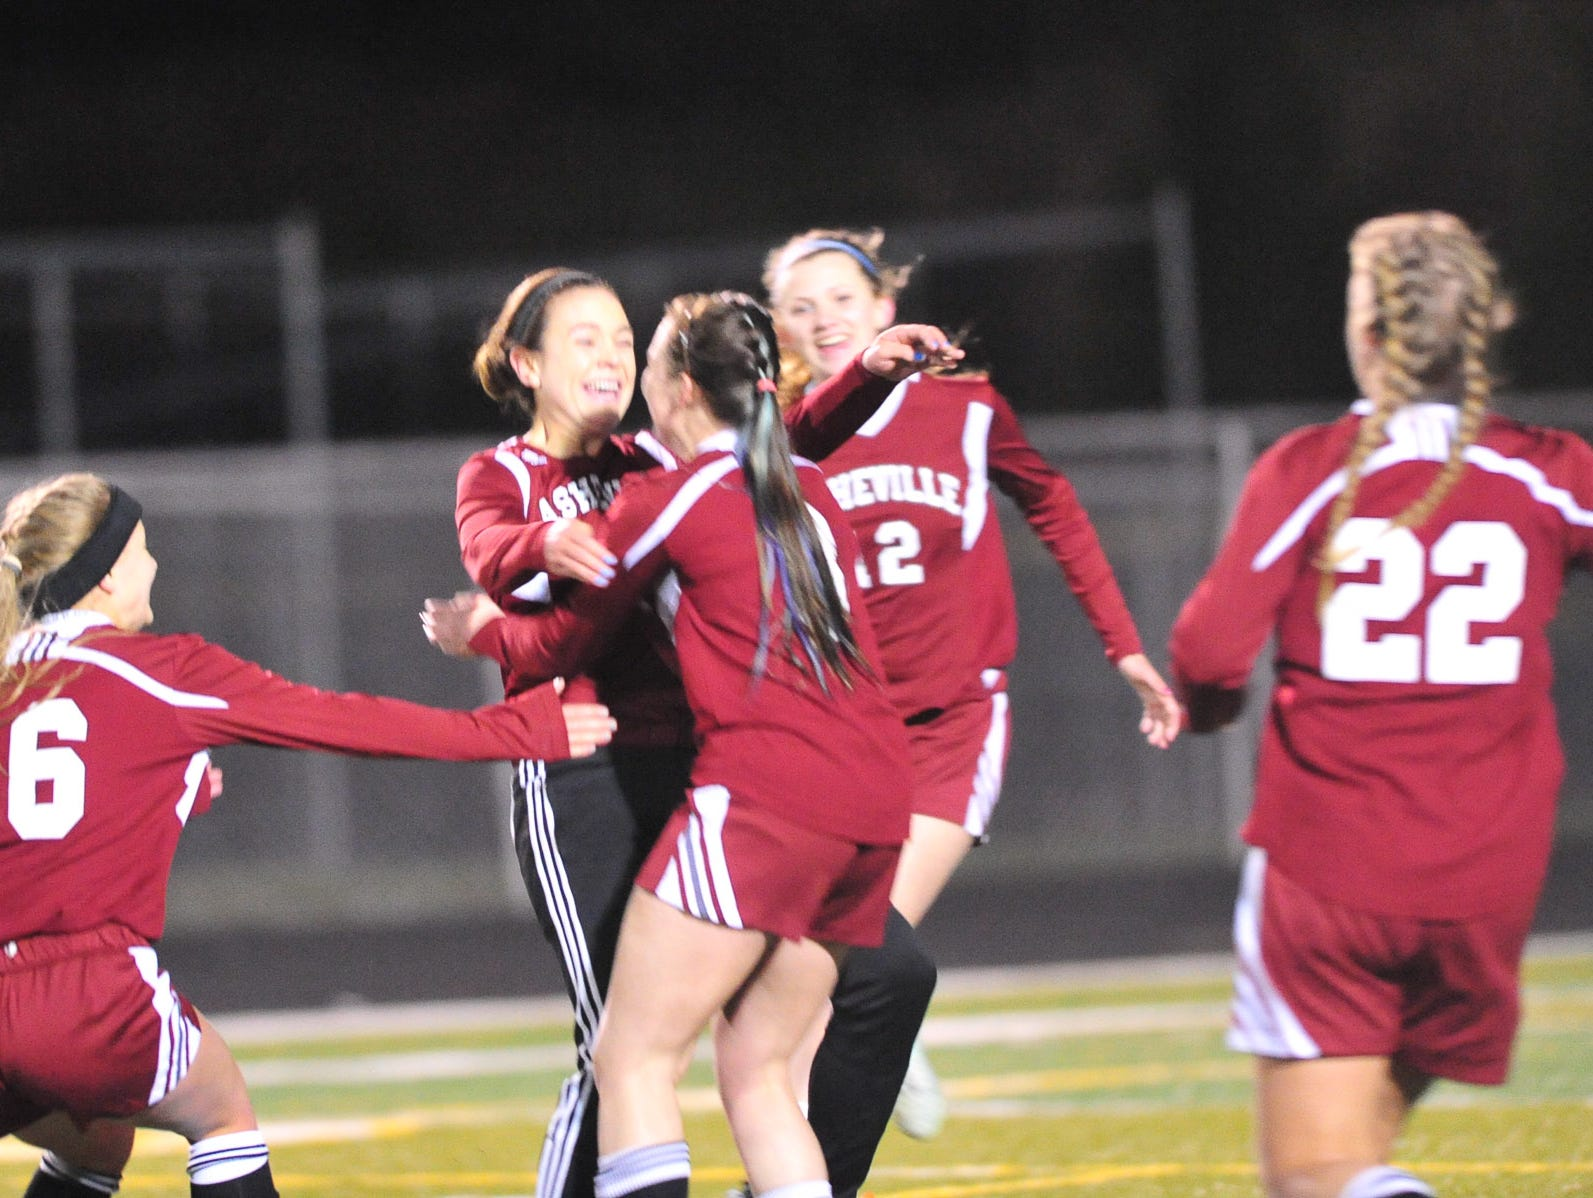 Teammates congratulate Asheville High's Sarah Sirkin after she scored a goal Monday night at Reynolds.